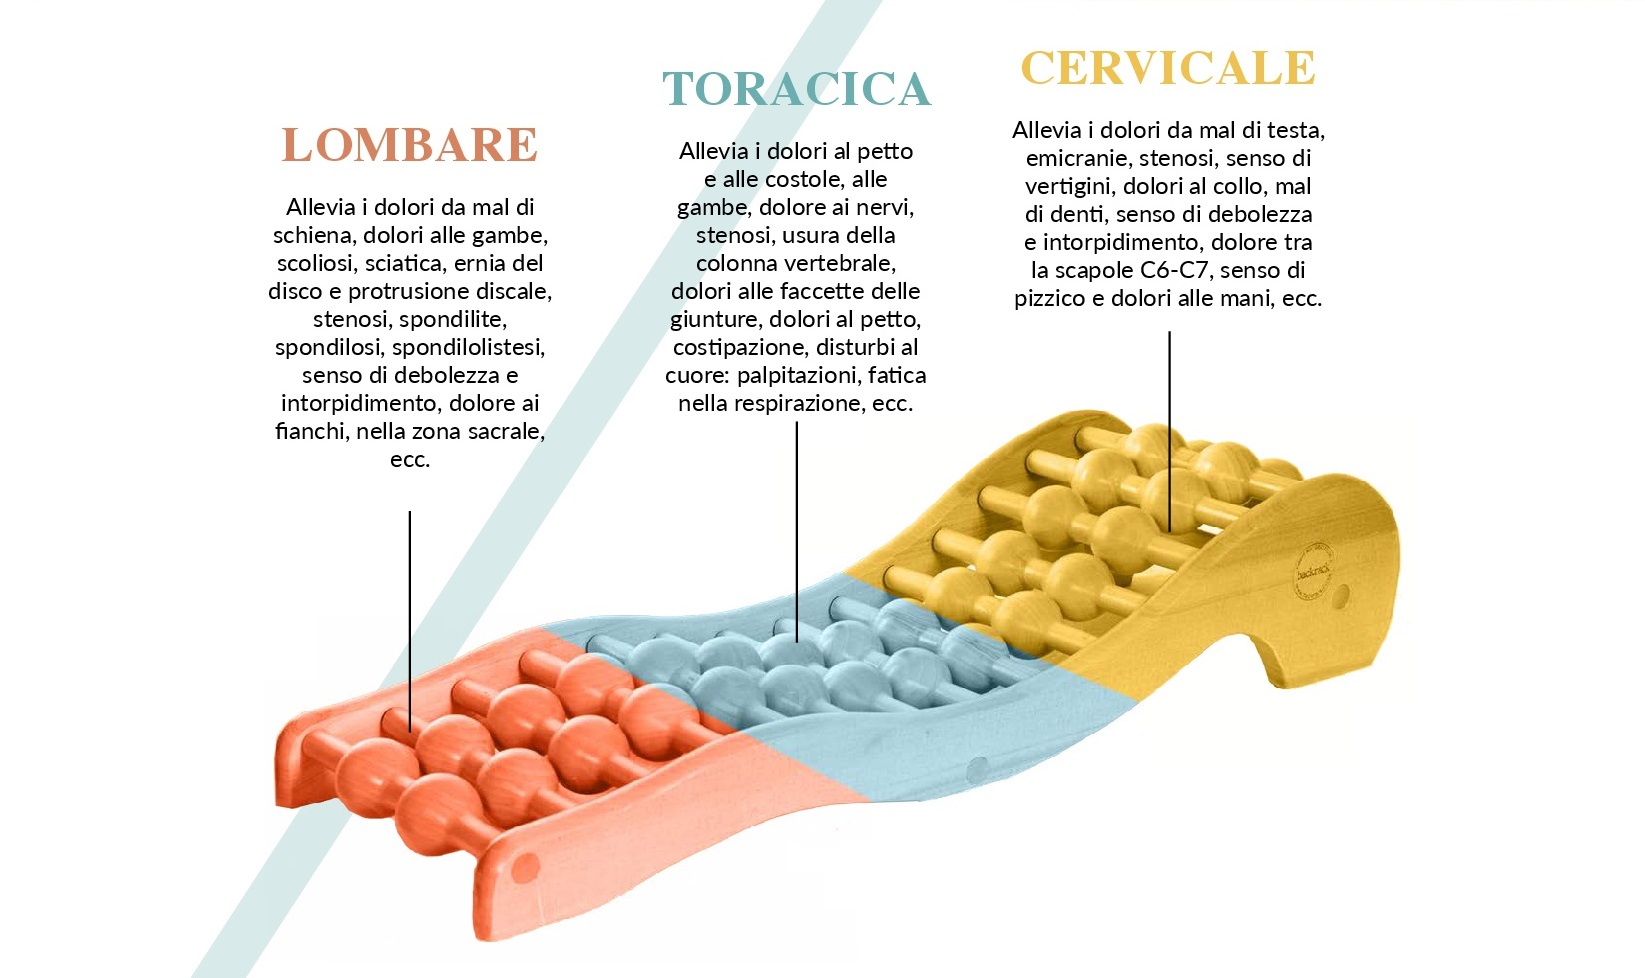 backrack firenze - Emanuele Santinelli